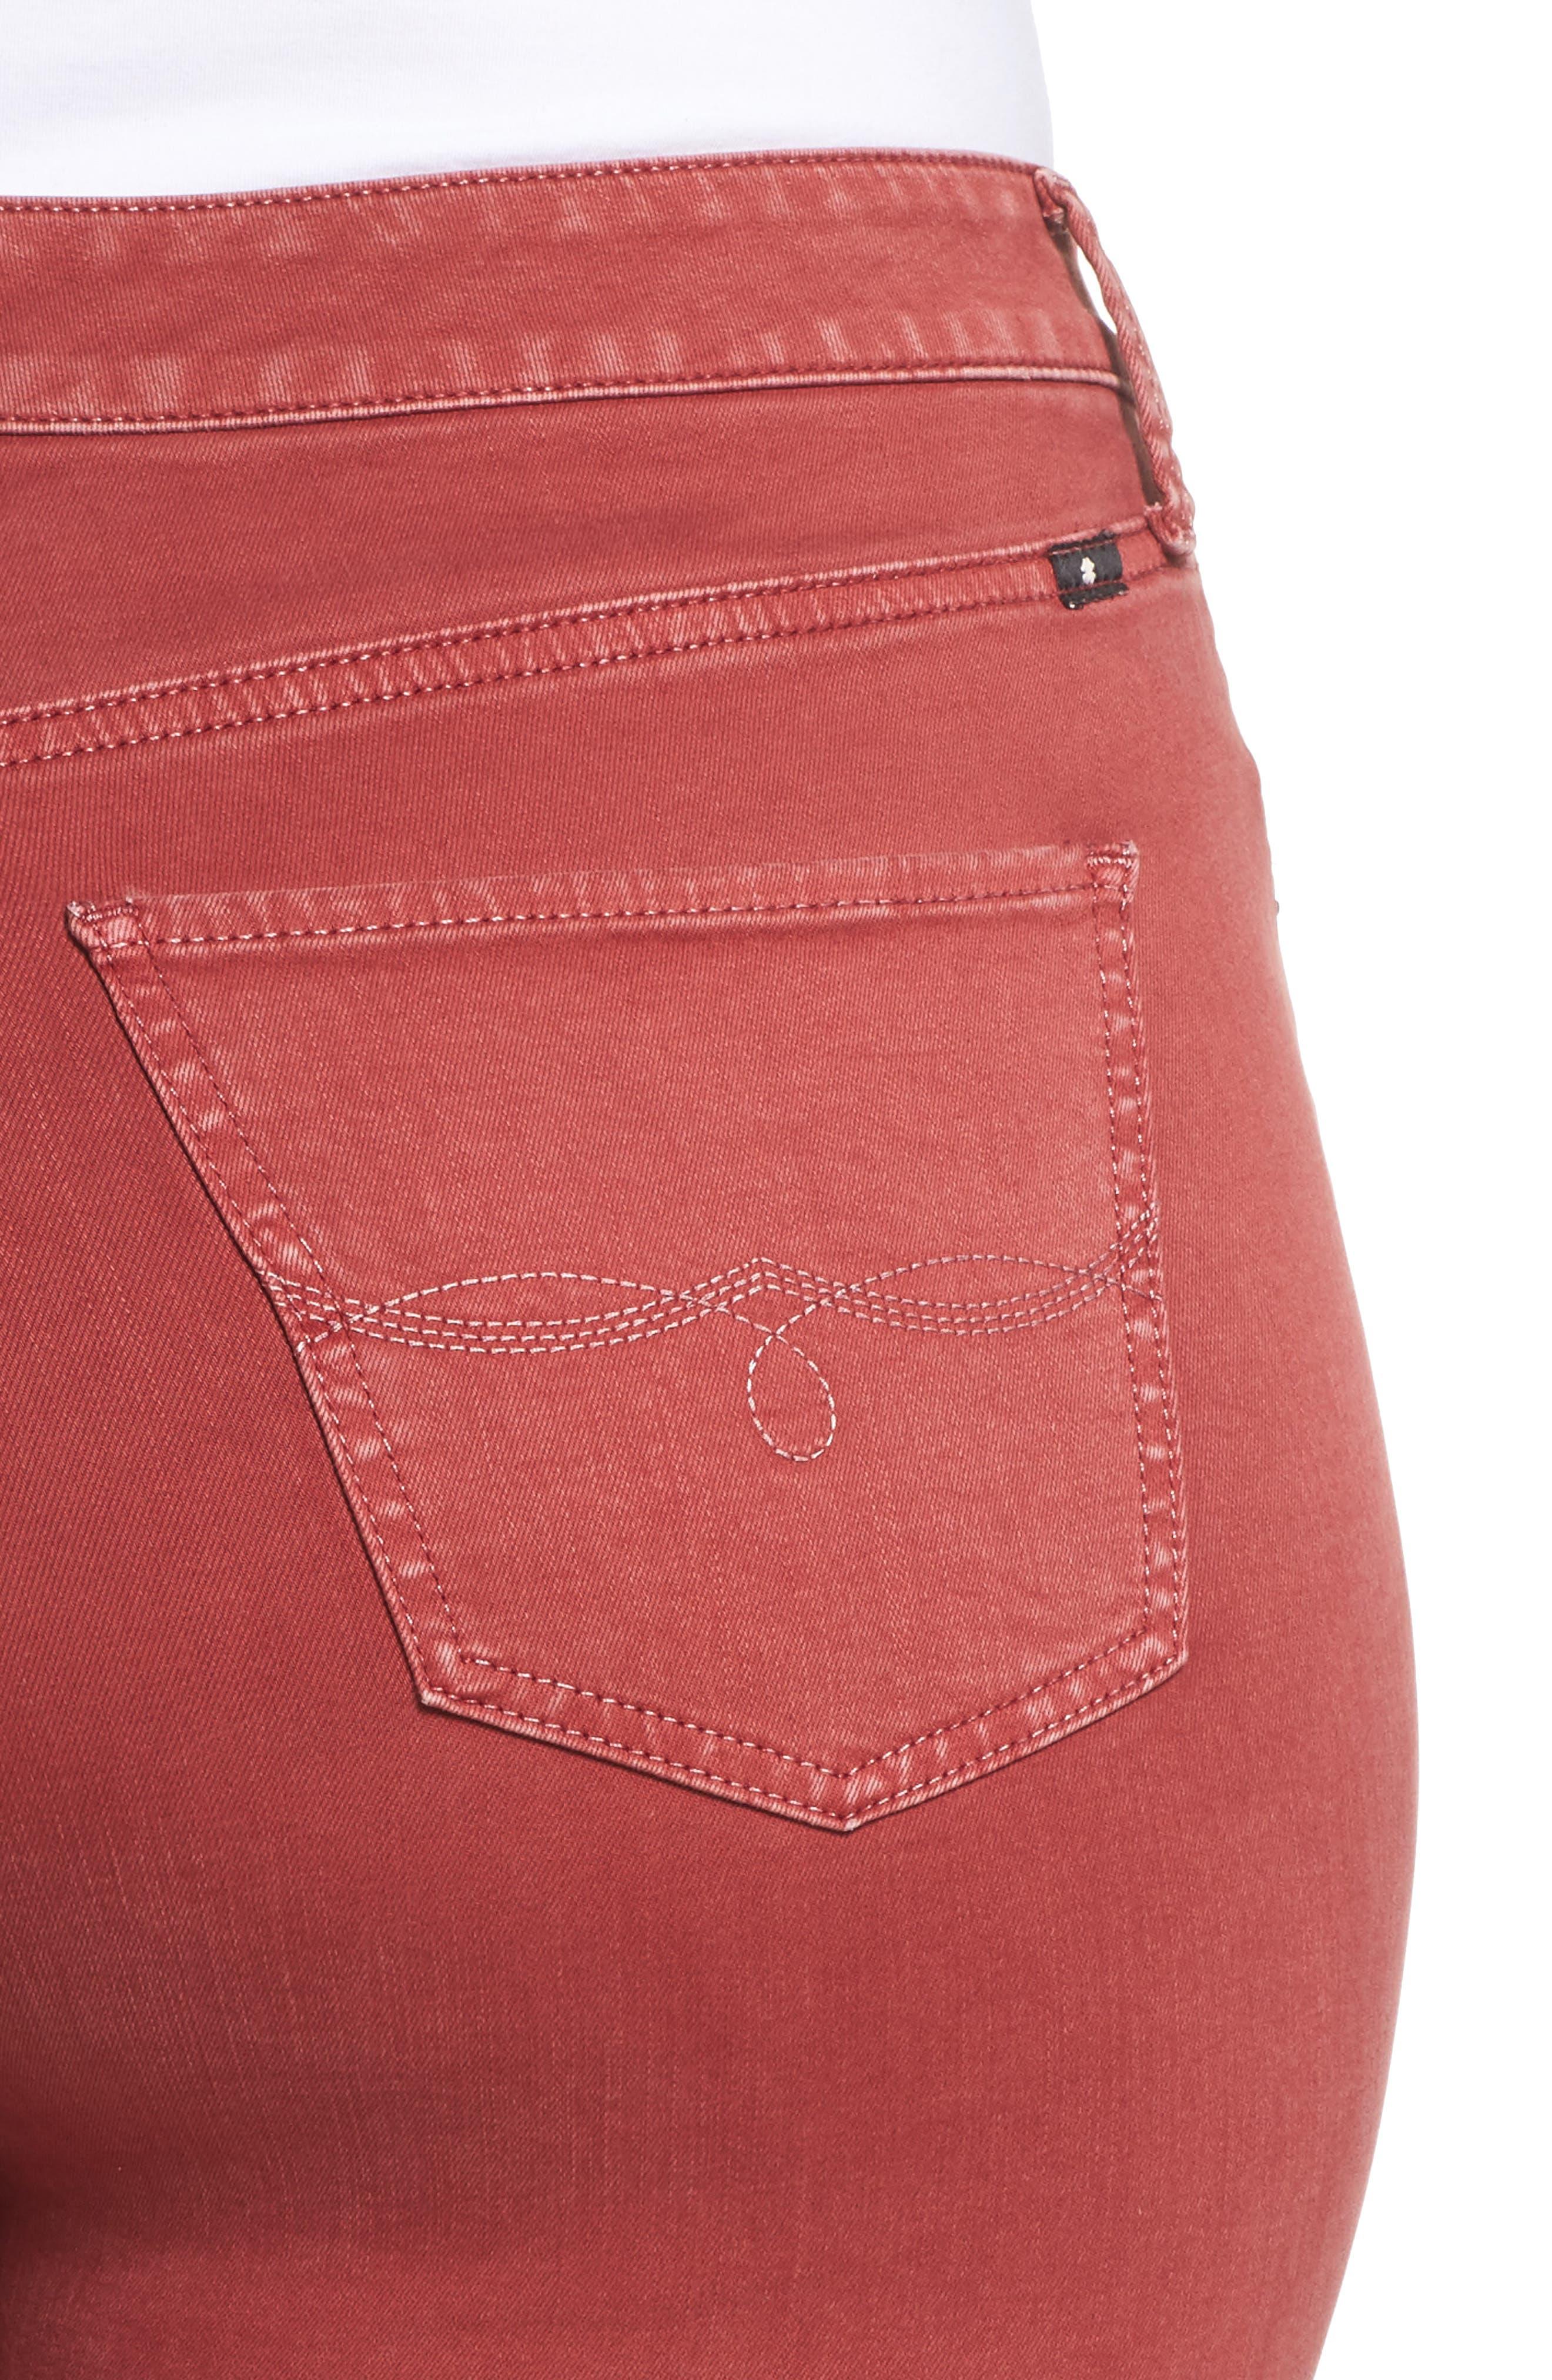 Emma Crop Jeans,                             Alternate thumbnail 4, color,                             La Cara